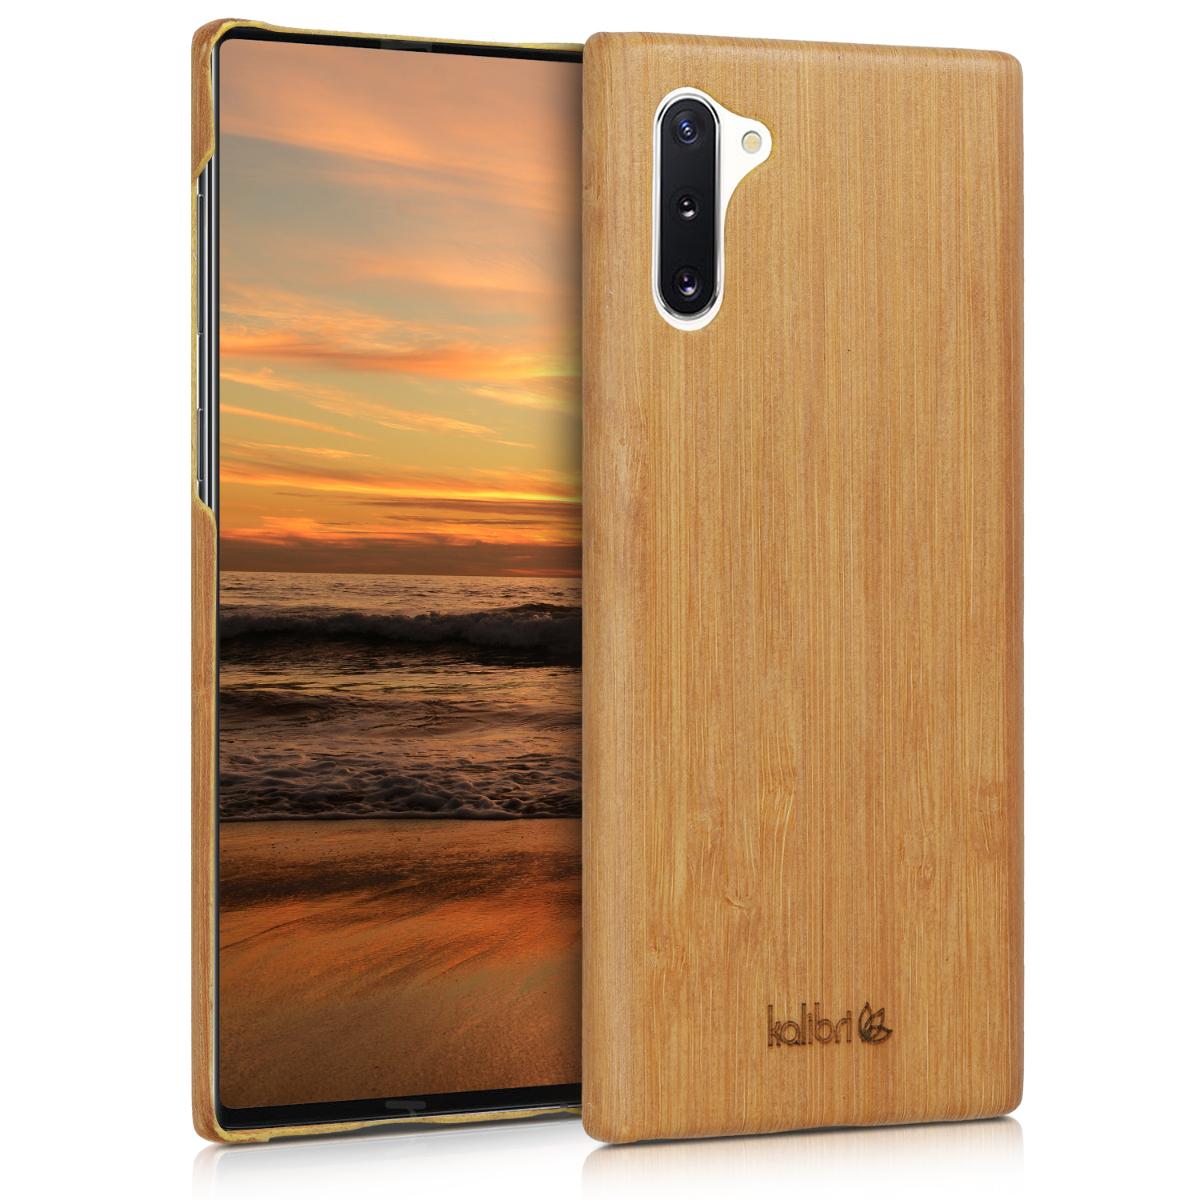 Kalibri Ξύλινη Θήκη Samsung Galaxy Note 10 - Natural Hard Wooden Protective Cover (49277.24)